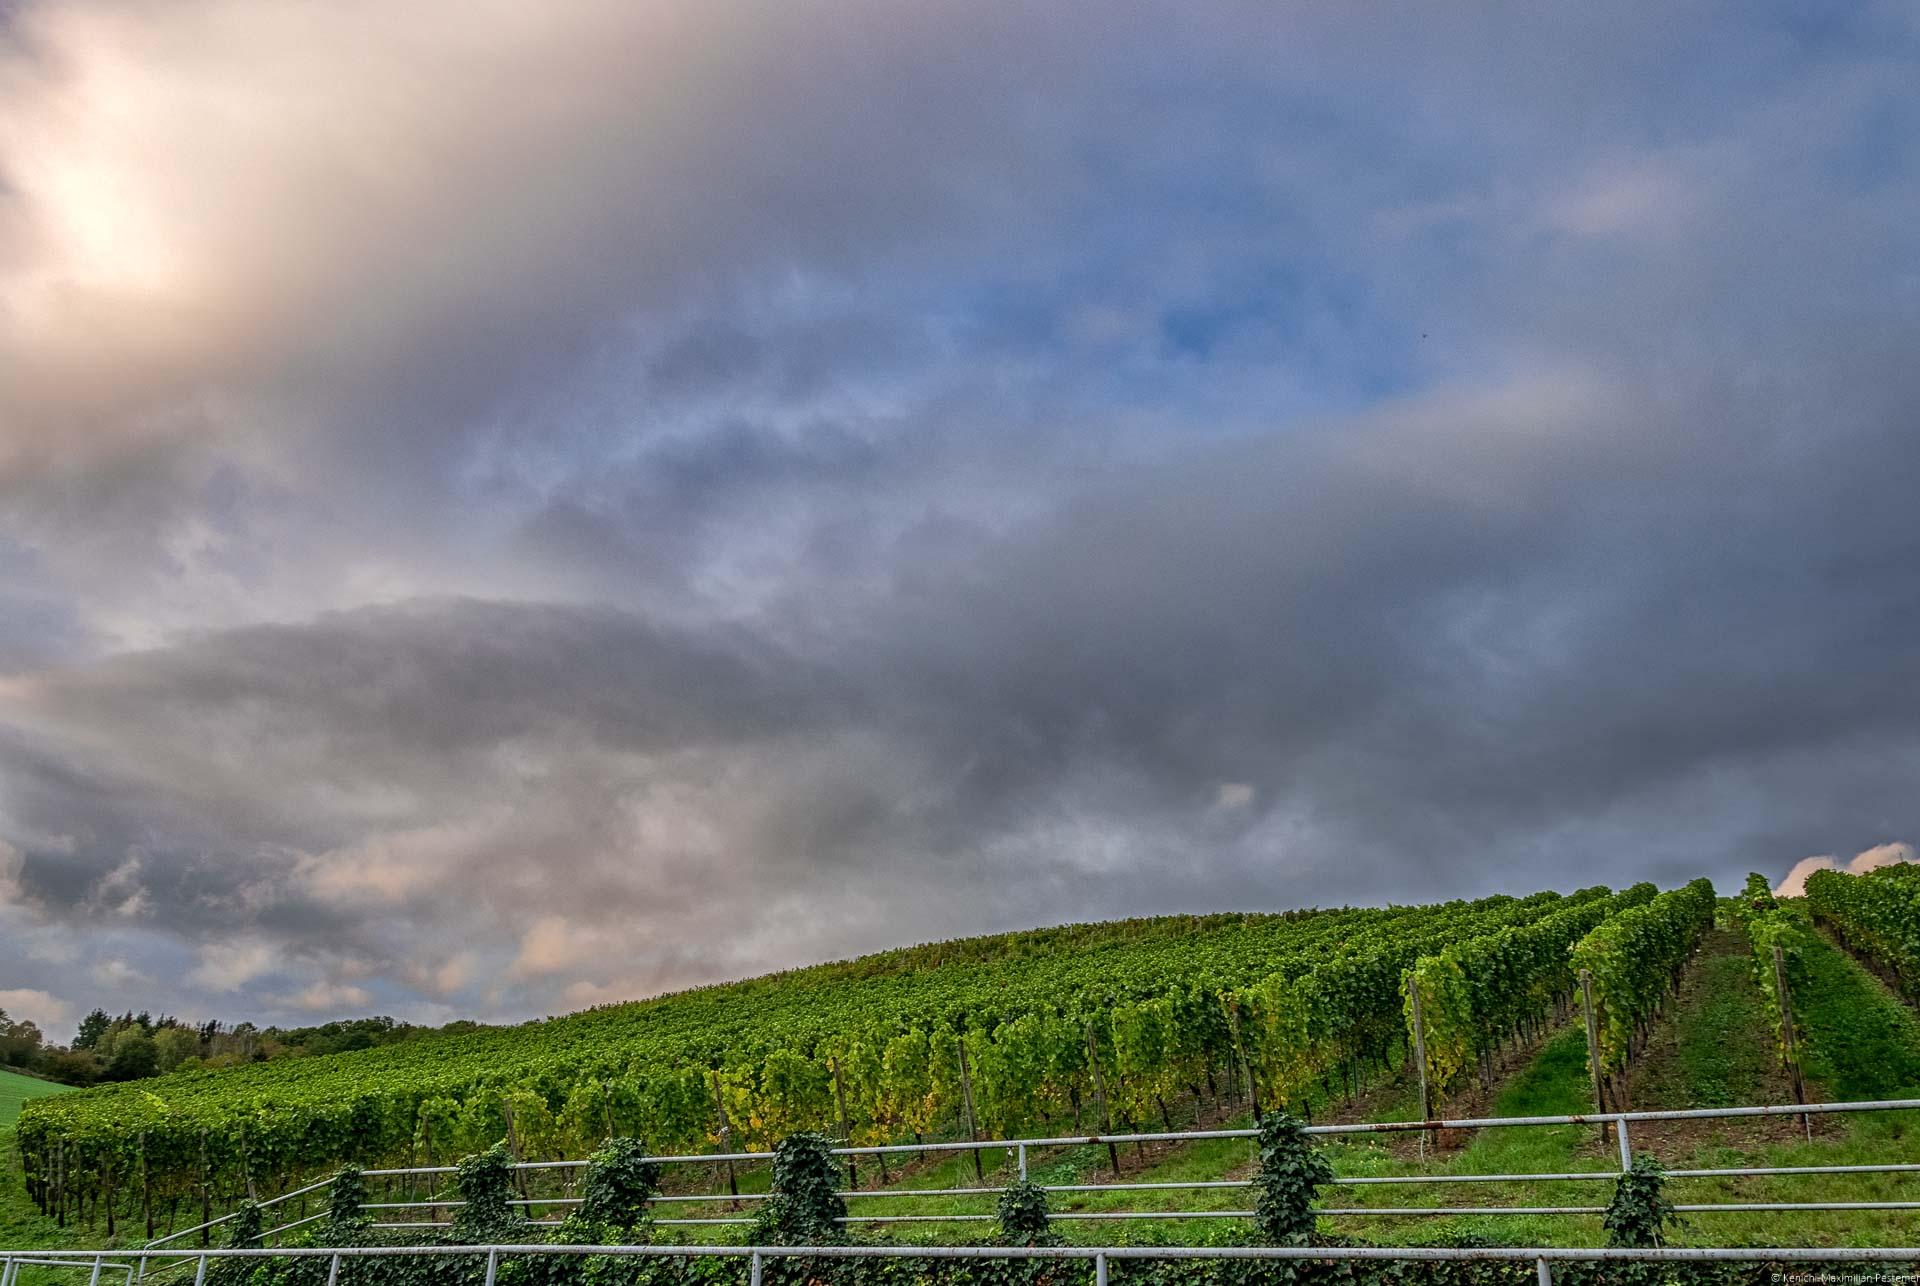 Weinberg Heppinger Berg am Hang während der Abendsonne